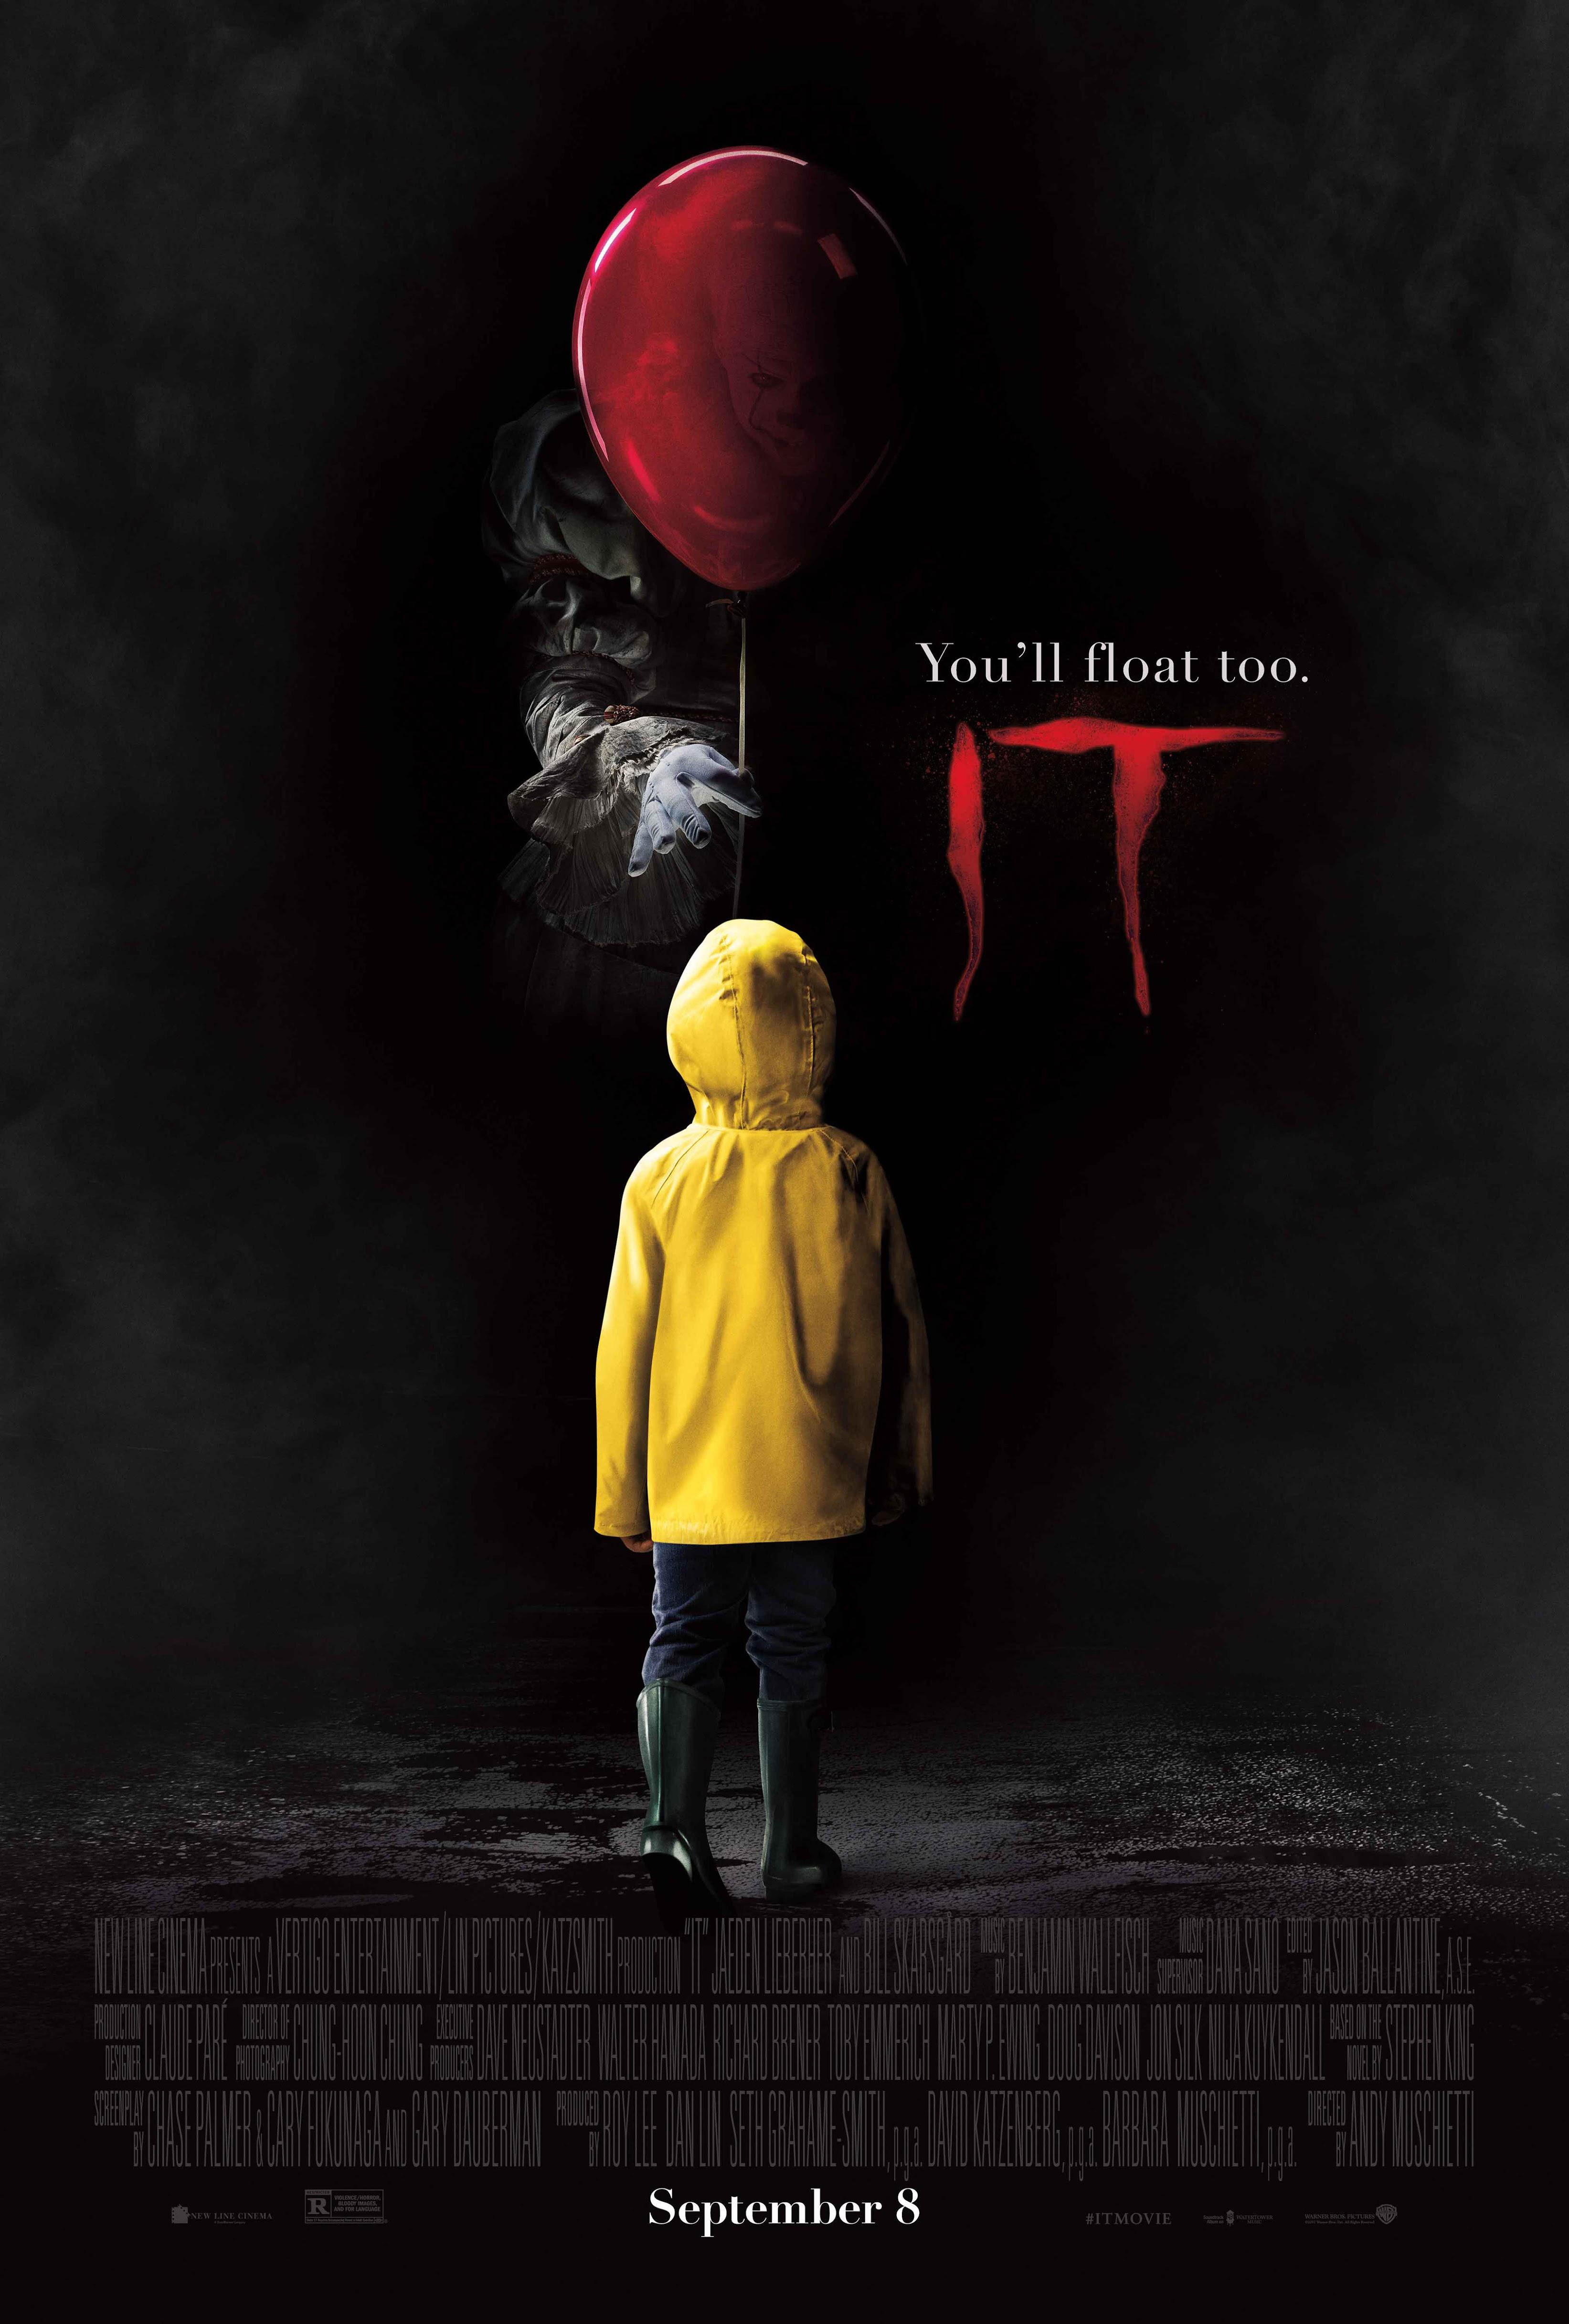 IT (film)